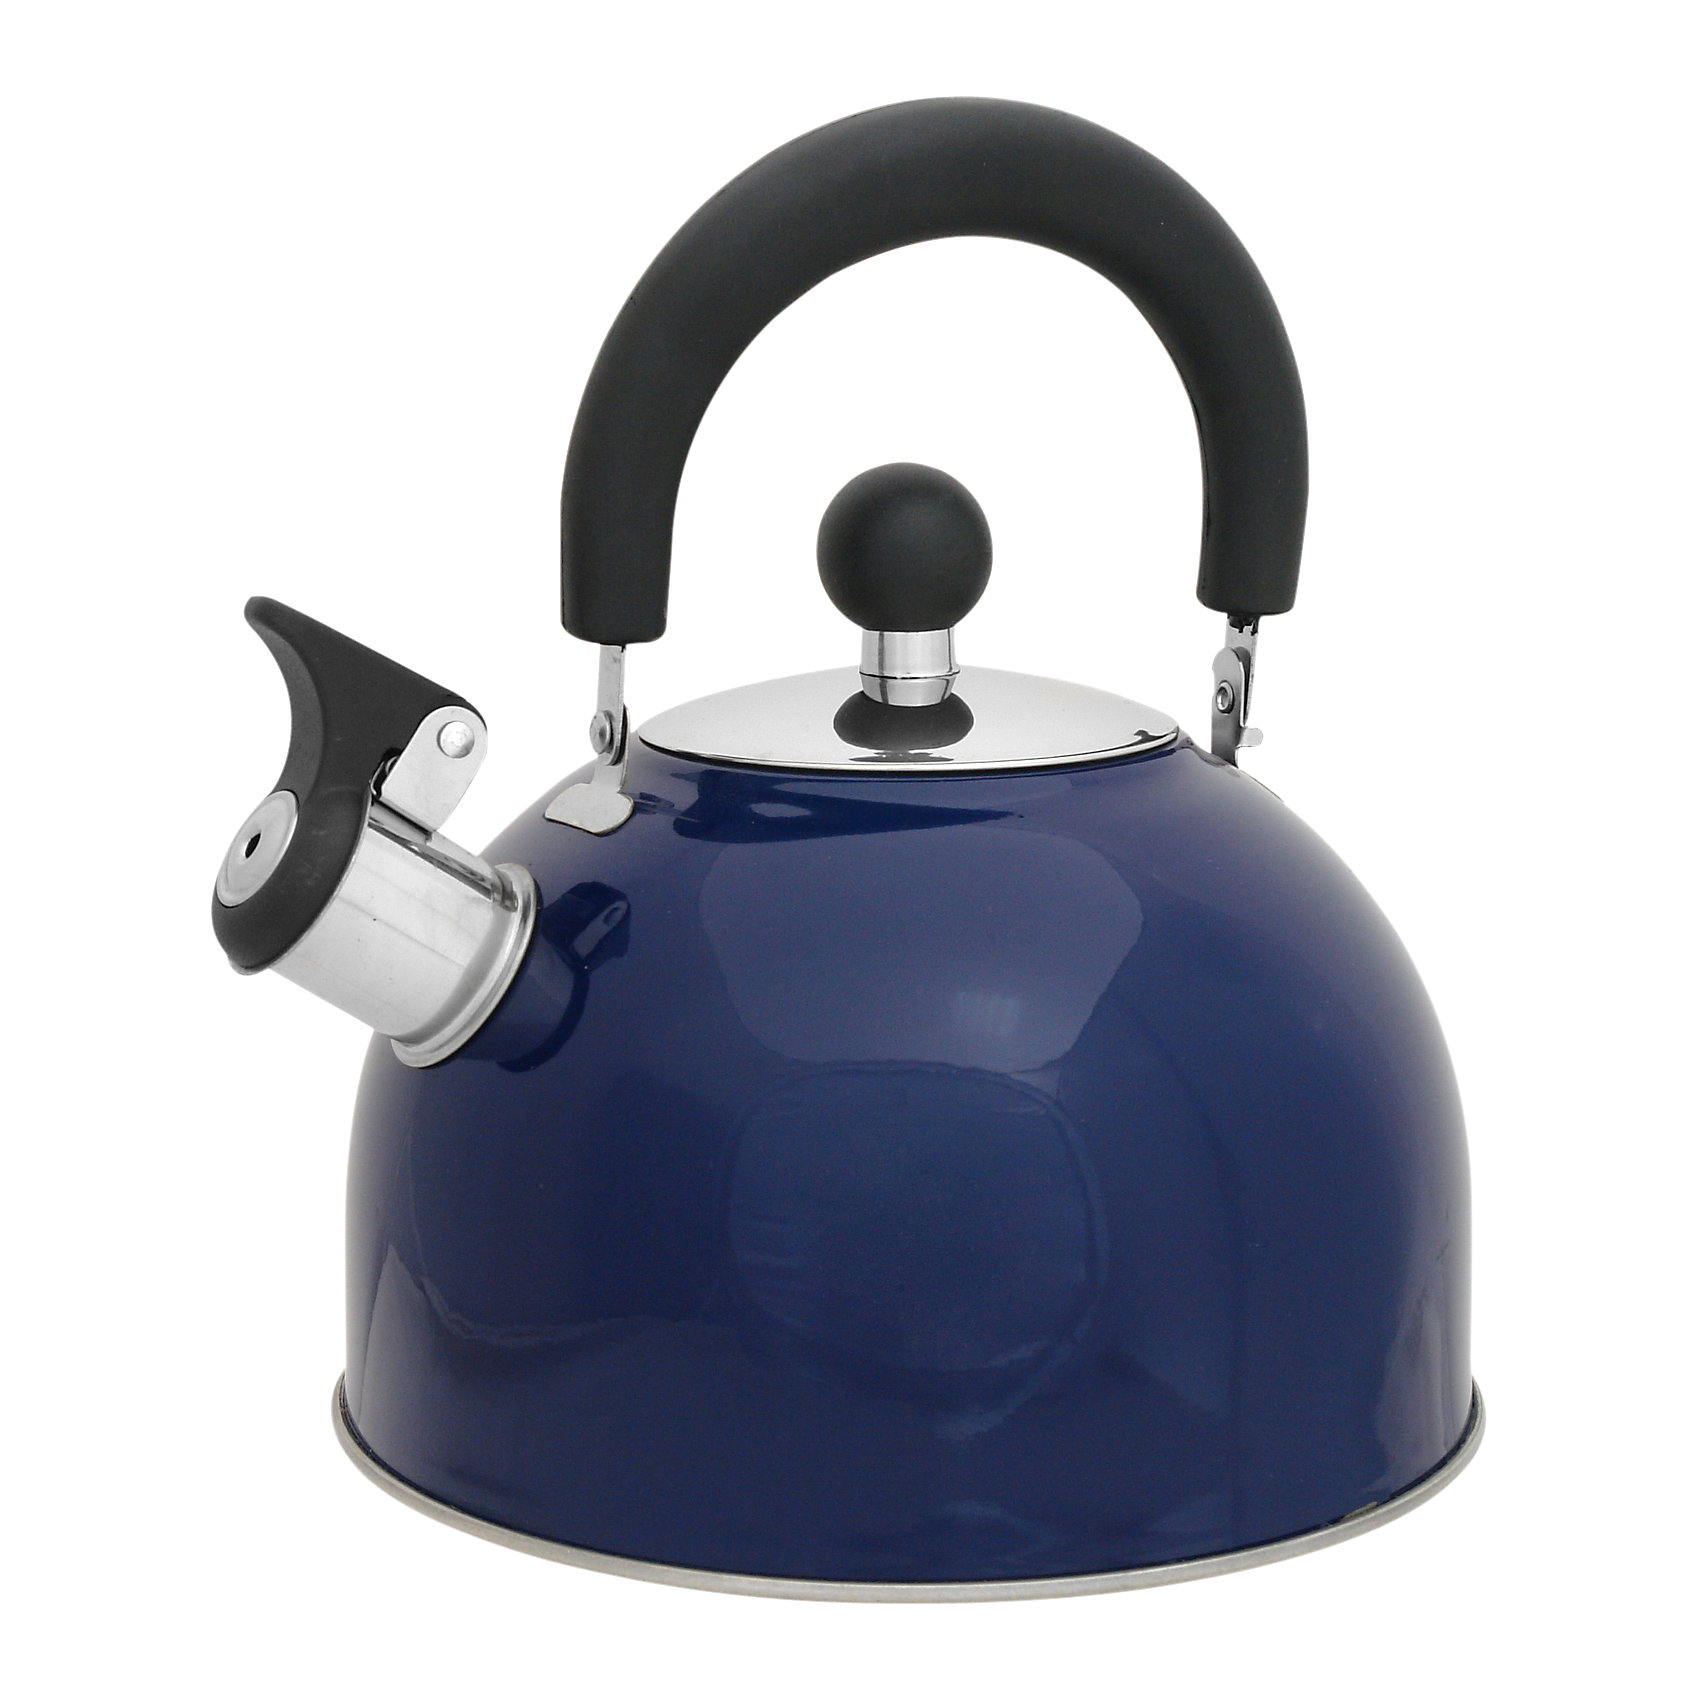 Чайник из нерж. стали MAL-039-B, 2,5 л, Mallony, синийБытовая техника для кухни<br>Чайник из нерж. стали MAL-039-B, 2,5 литра, синий, со свистком<br><br>Ширина мм: 190<br>Глубина мм: 190<br>Высота мм: 170<br>Вес г: 600<br>Возраст от месяцев: 216<br>Возраст до месяцев: 1188<br>Пол: Унисекс<br>Возраст: Детский<br>SKU: 5622848